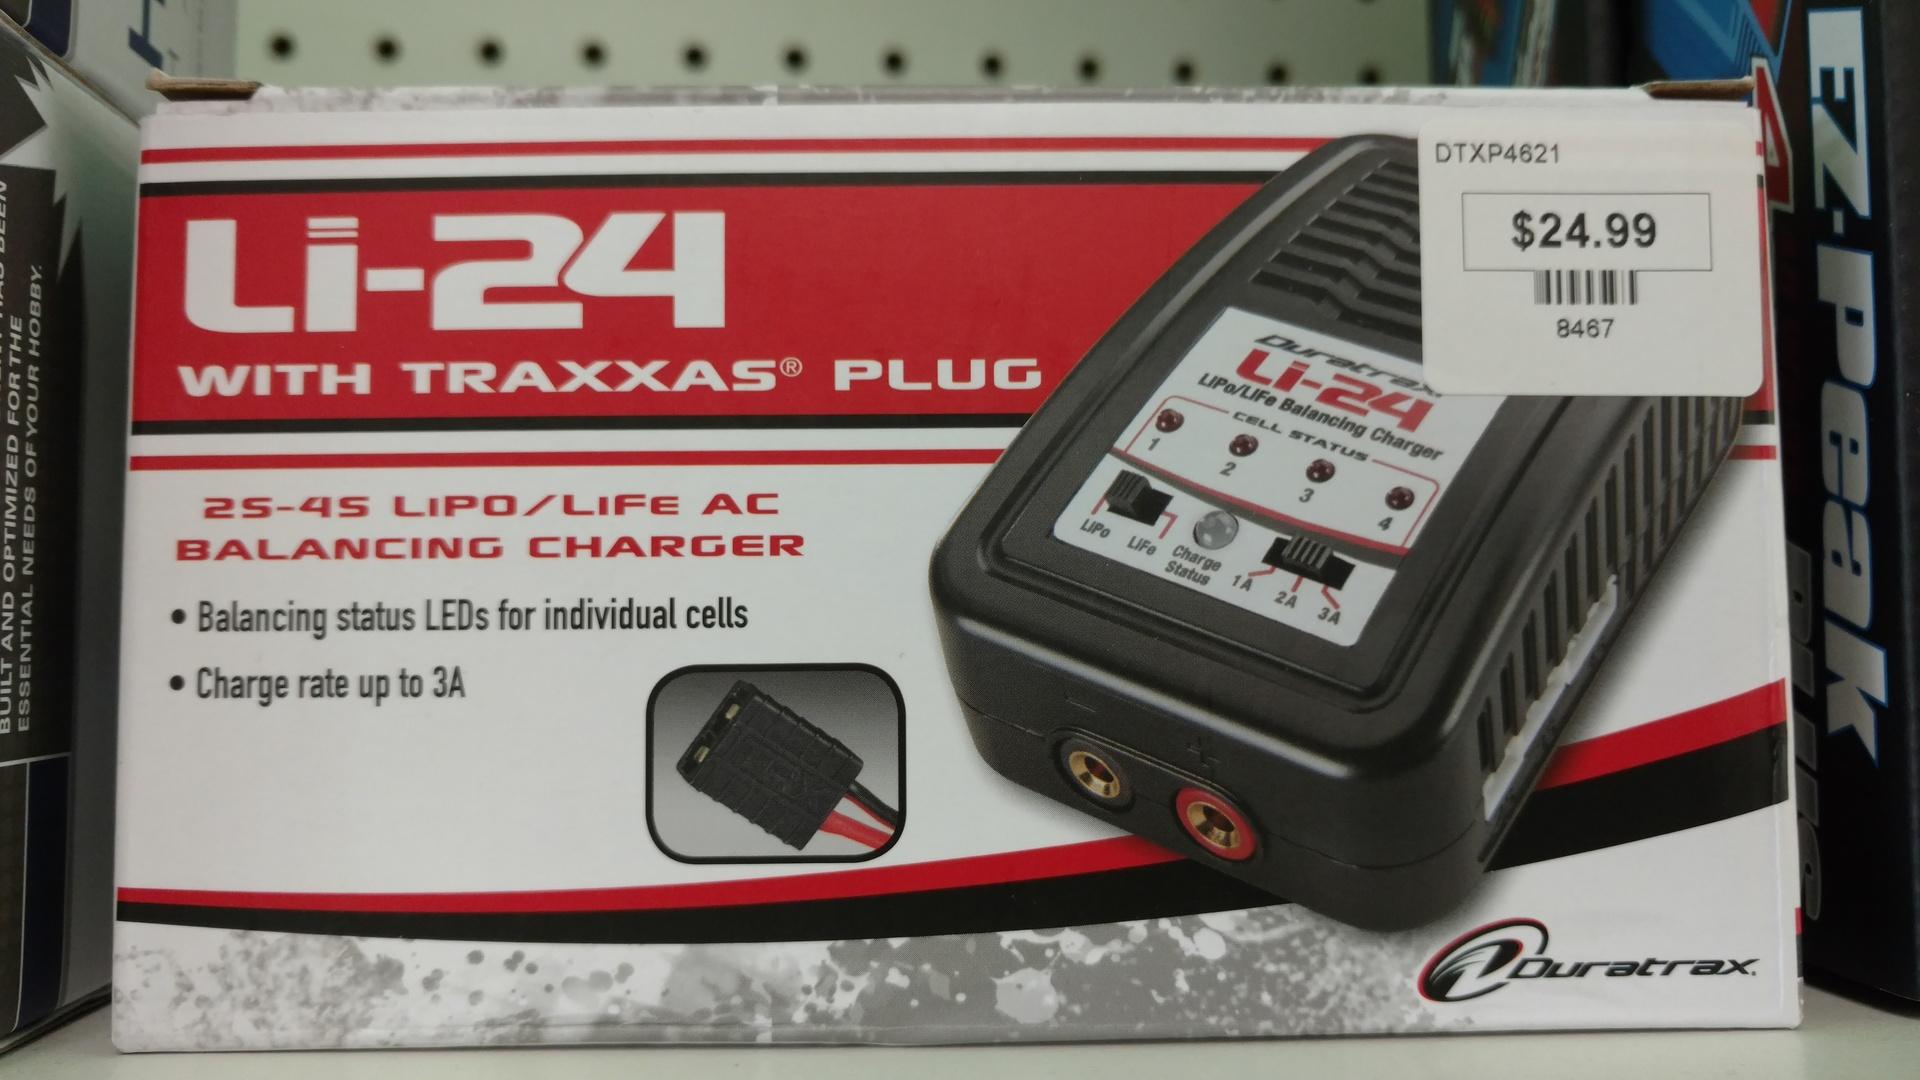 LI24 W/TRAXXAS PLUG